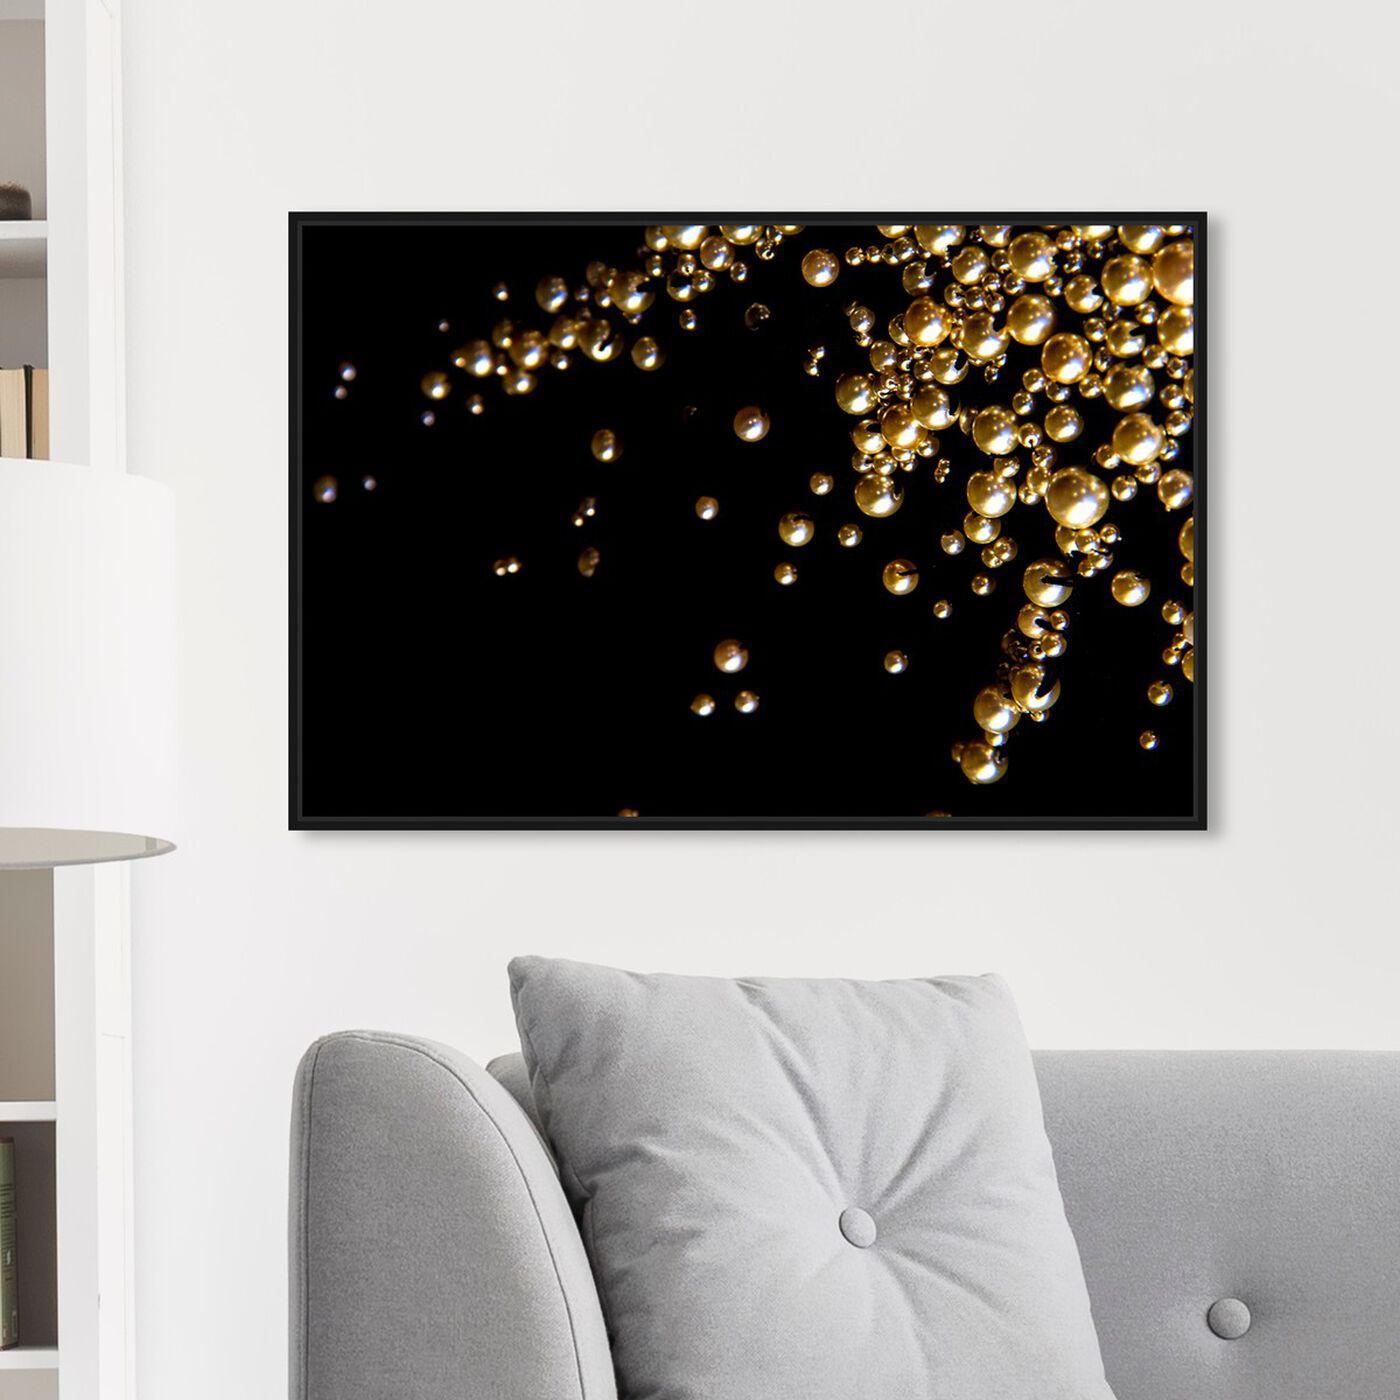 Hanging view of Mark Zunino - Raining Beads featuring fashion and glam and jewelry art.